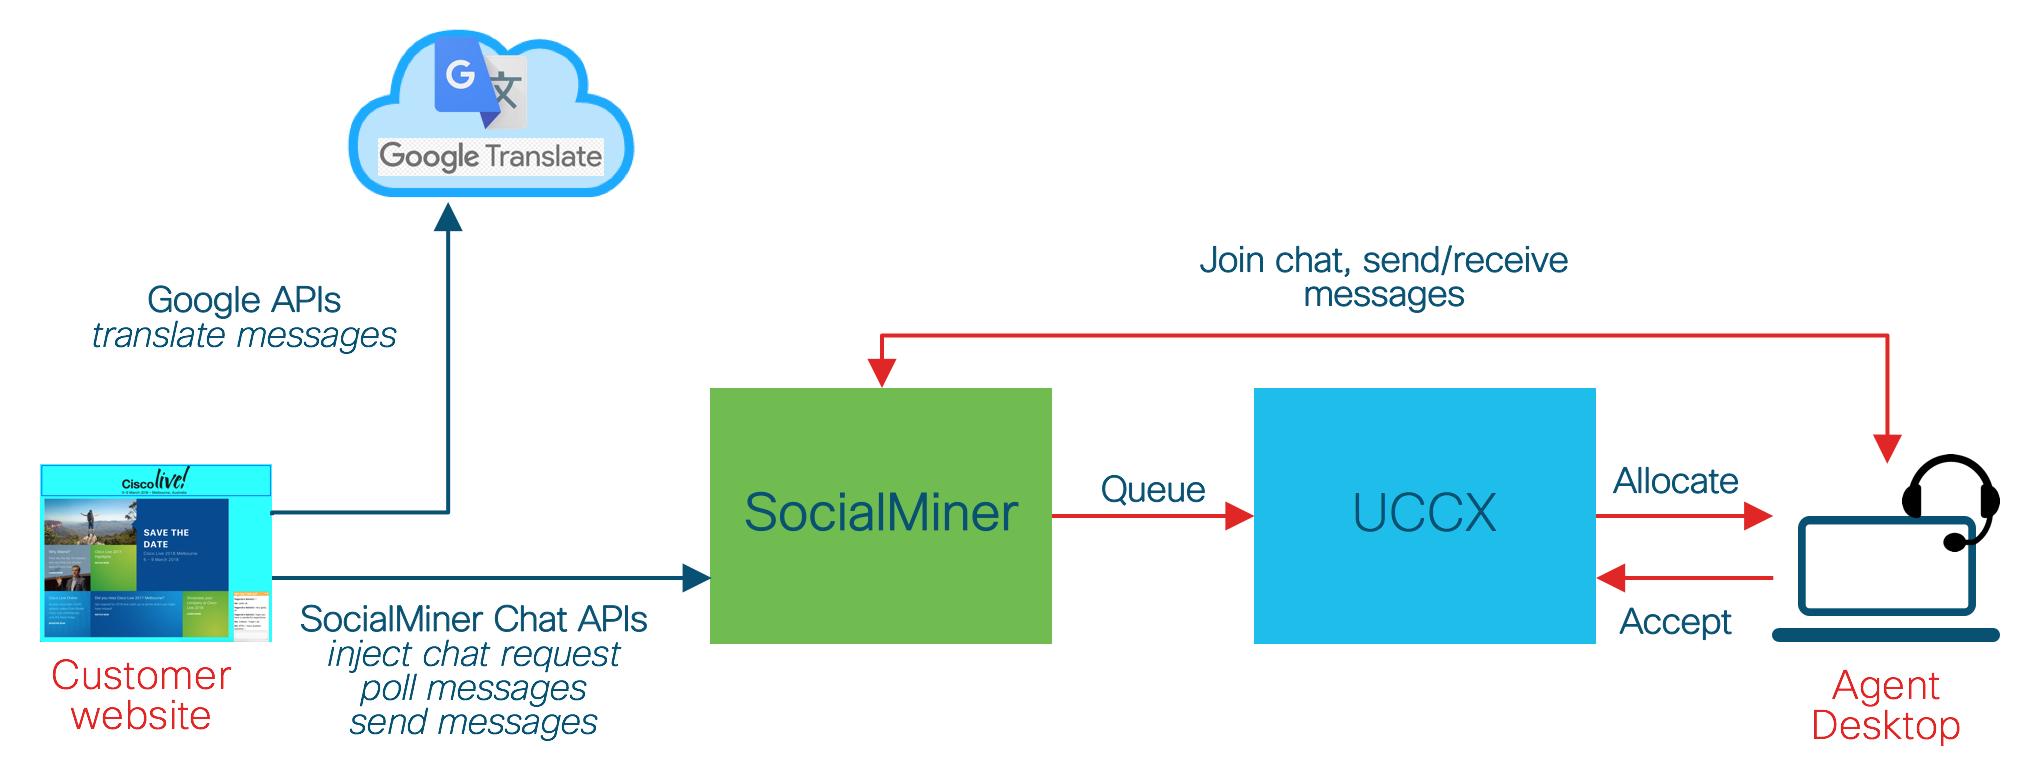 GitHub - umnagendra/socialminer-pop-chat: Illustrates a